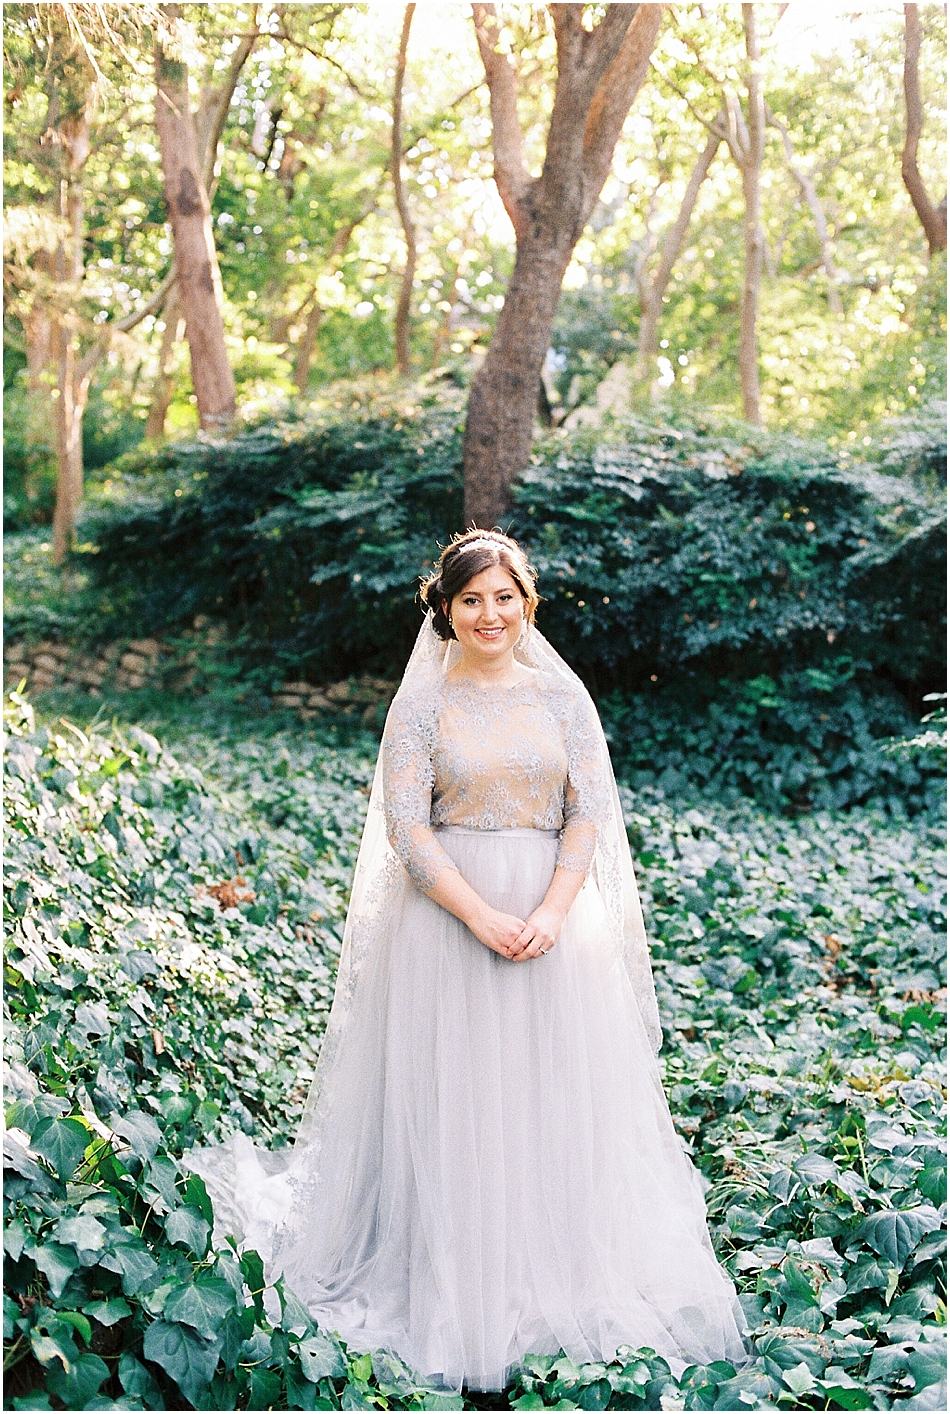 Chandler Bridal   Dallas Bride   Film   Brides of North Texas   Emilie Anne Photography   Dallas Photographer-13.jpg